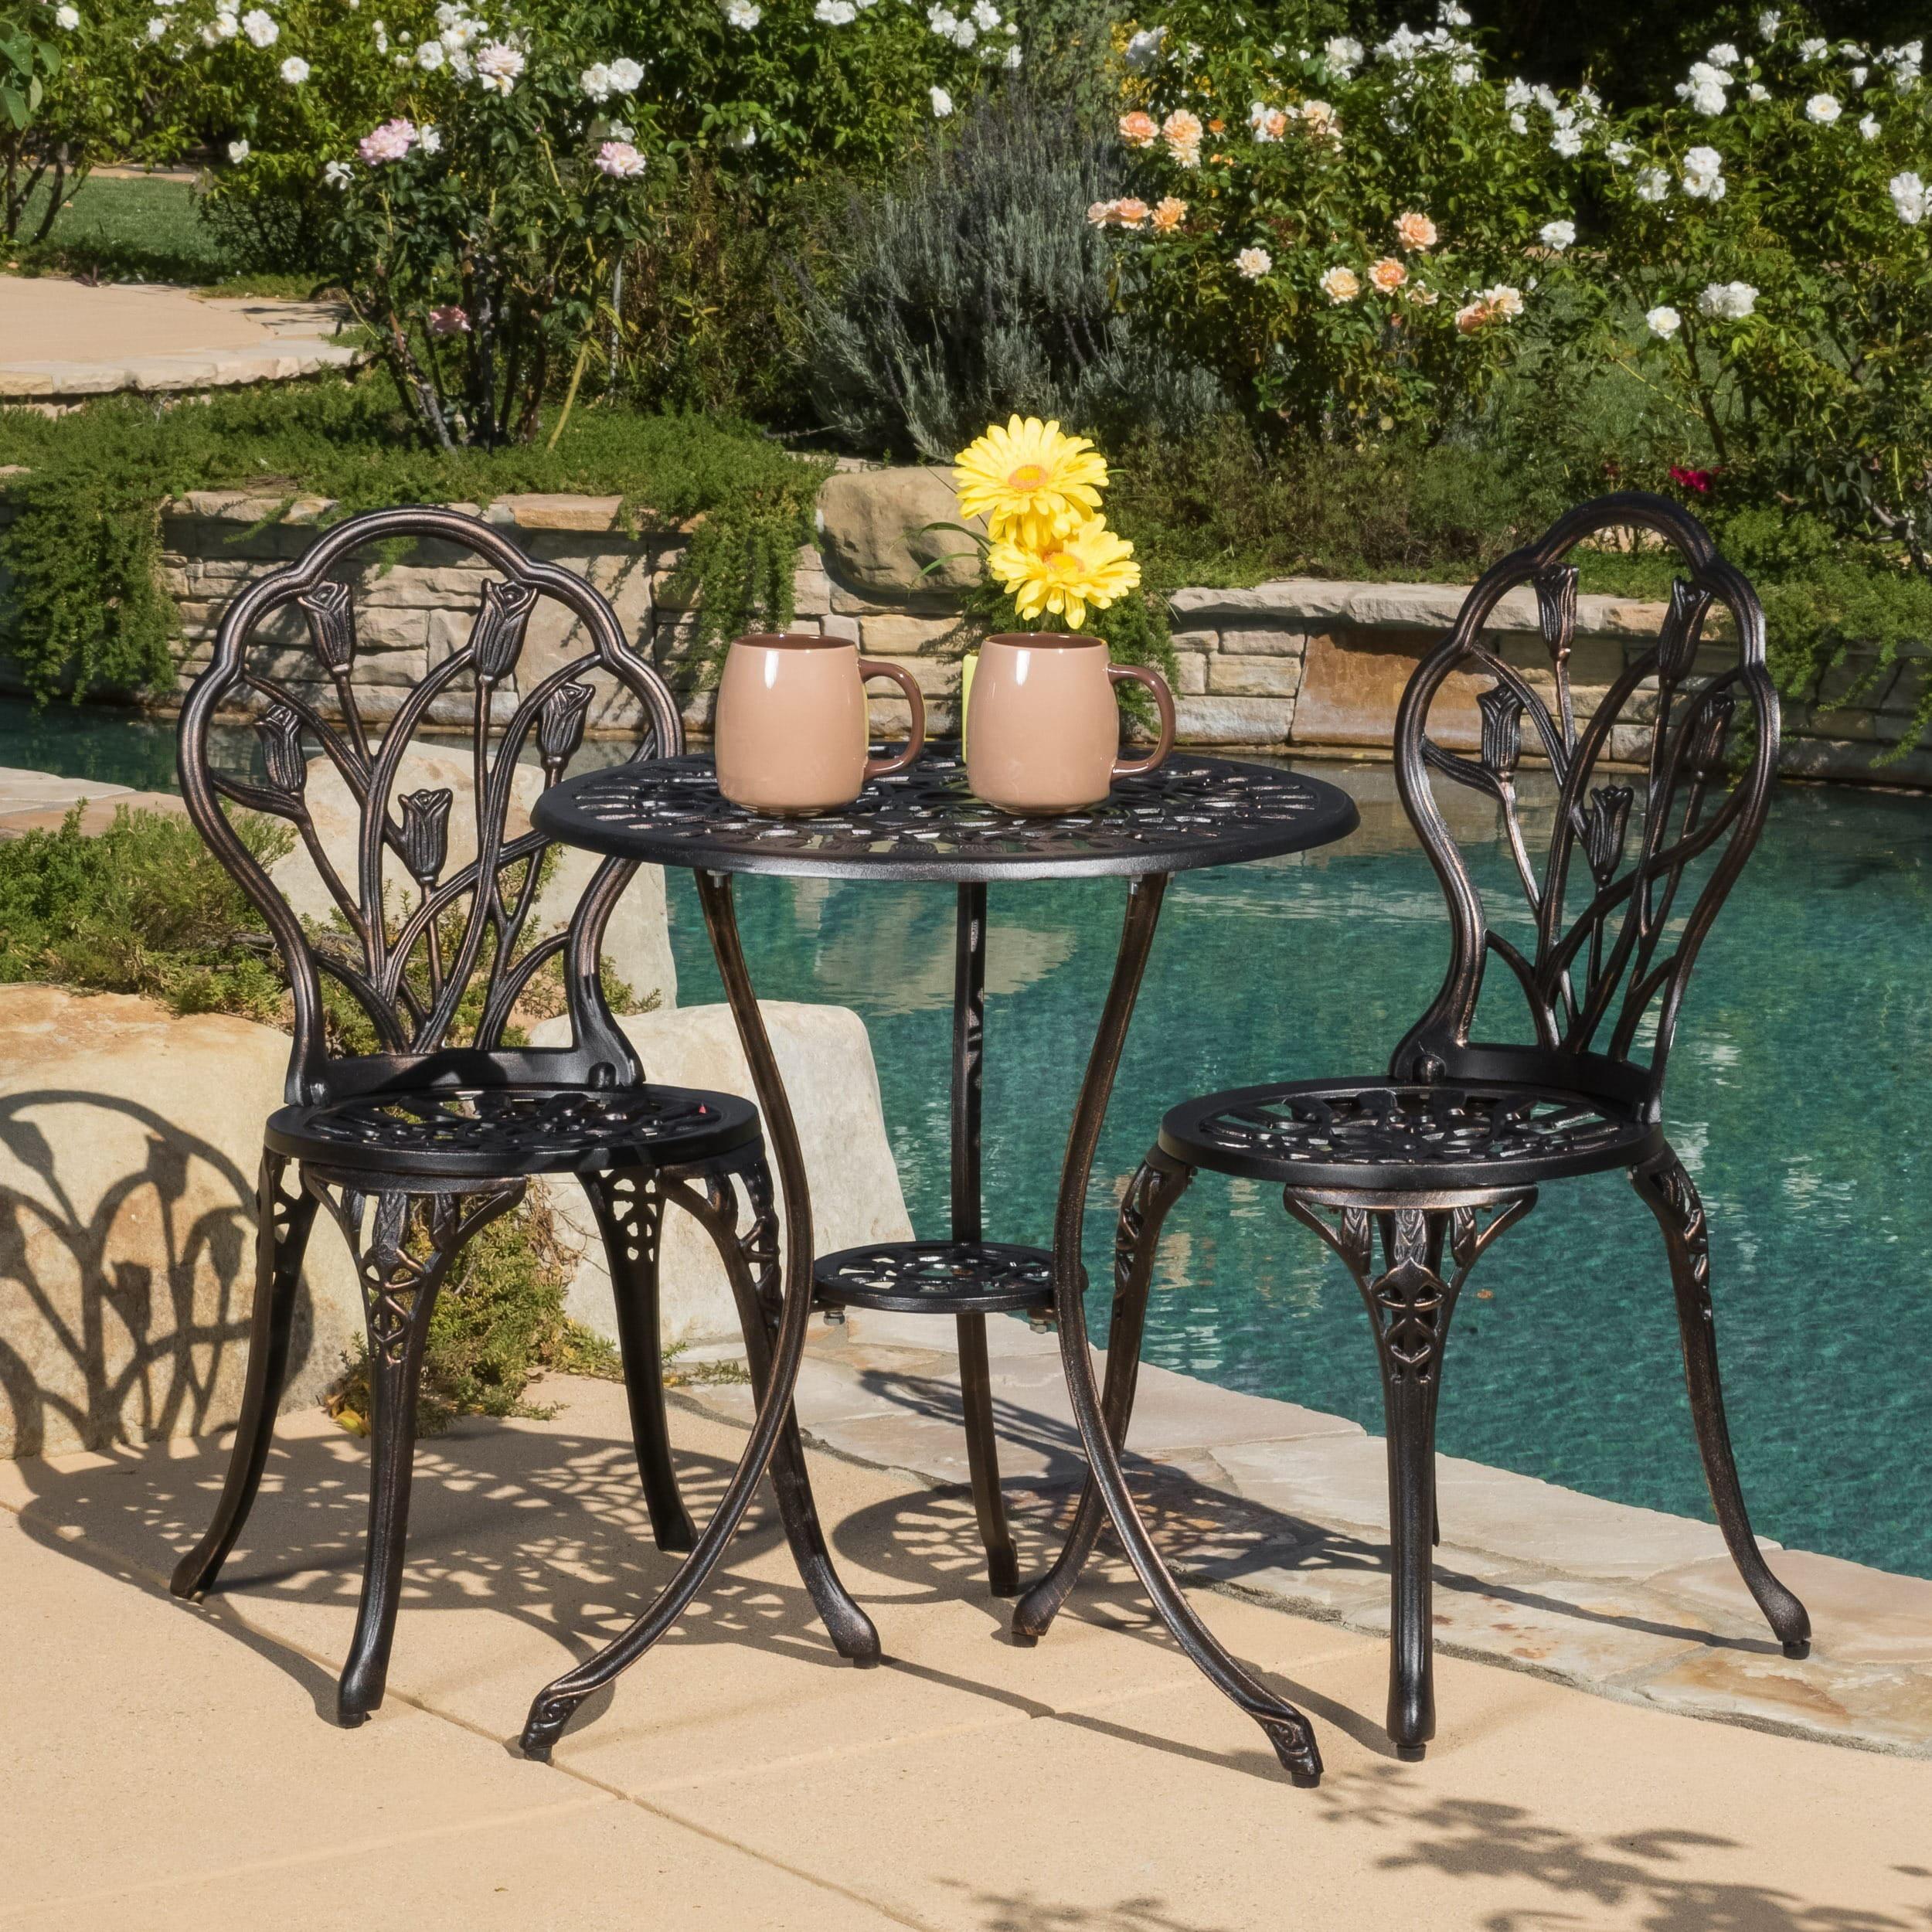 outdoor bistro table set Cast Aluminum Rose Brown Outdoor Bistro Set   Walmart.com outdoor bistro table set